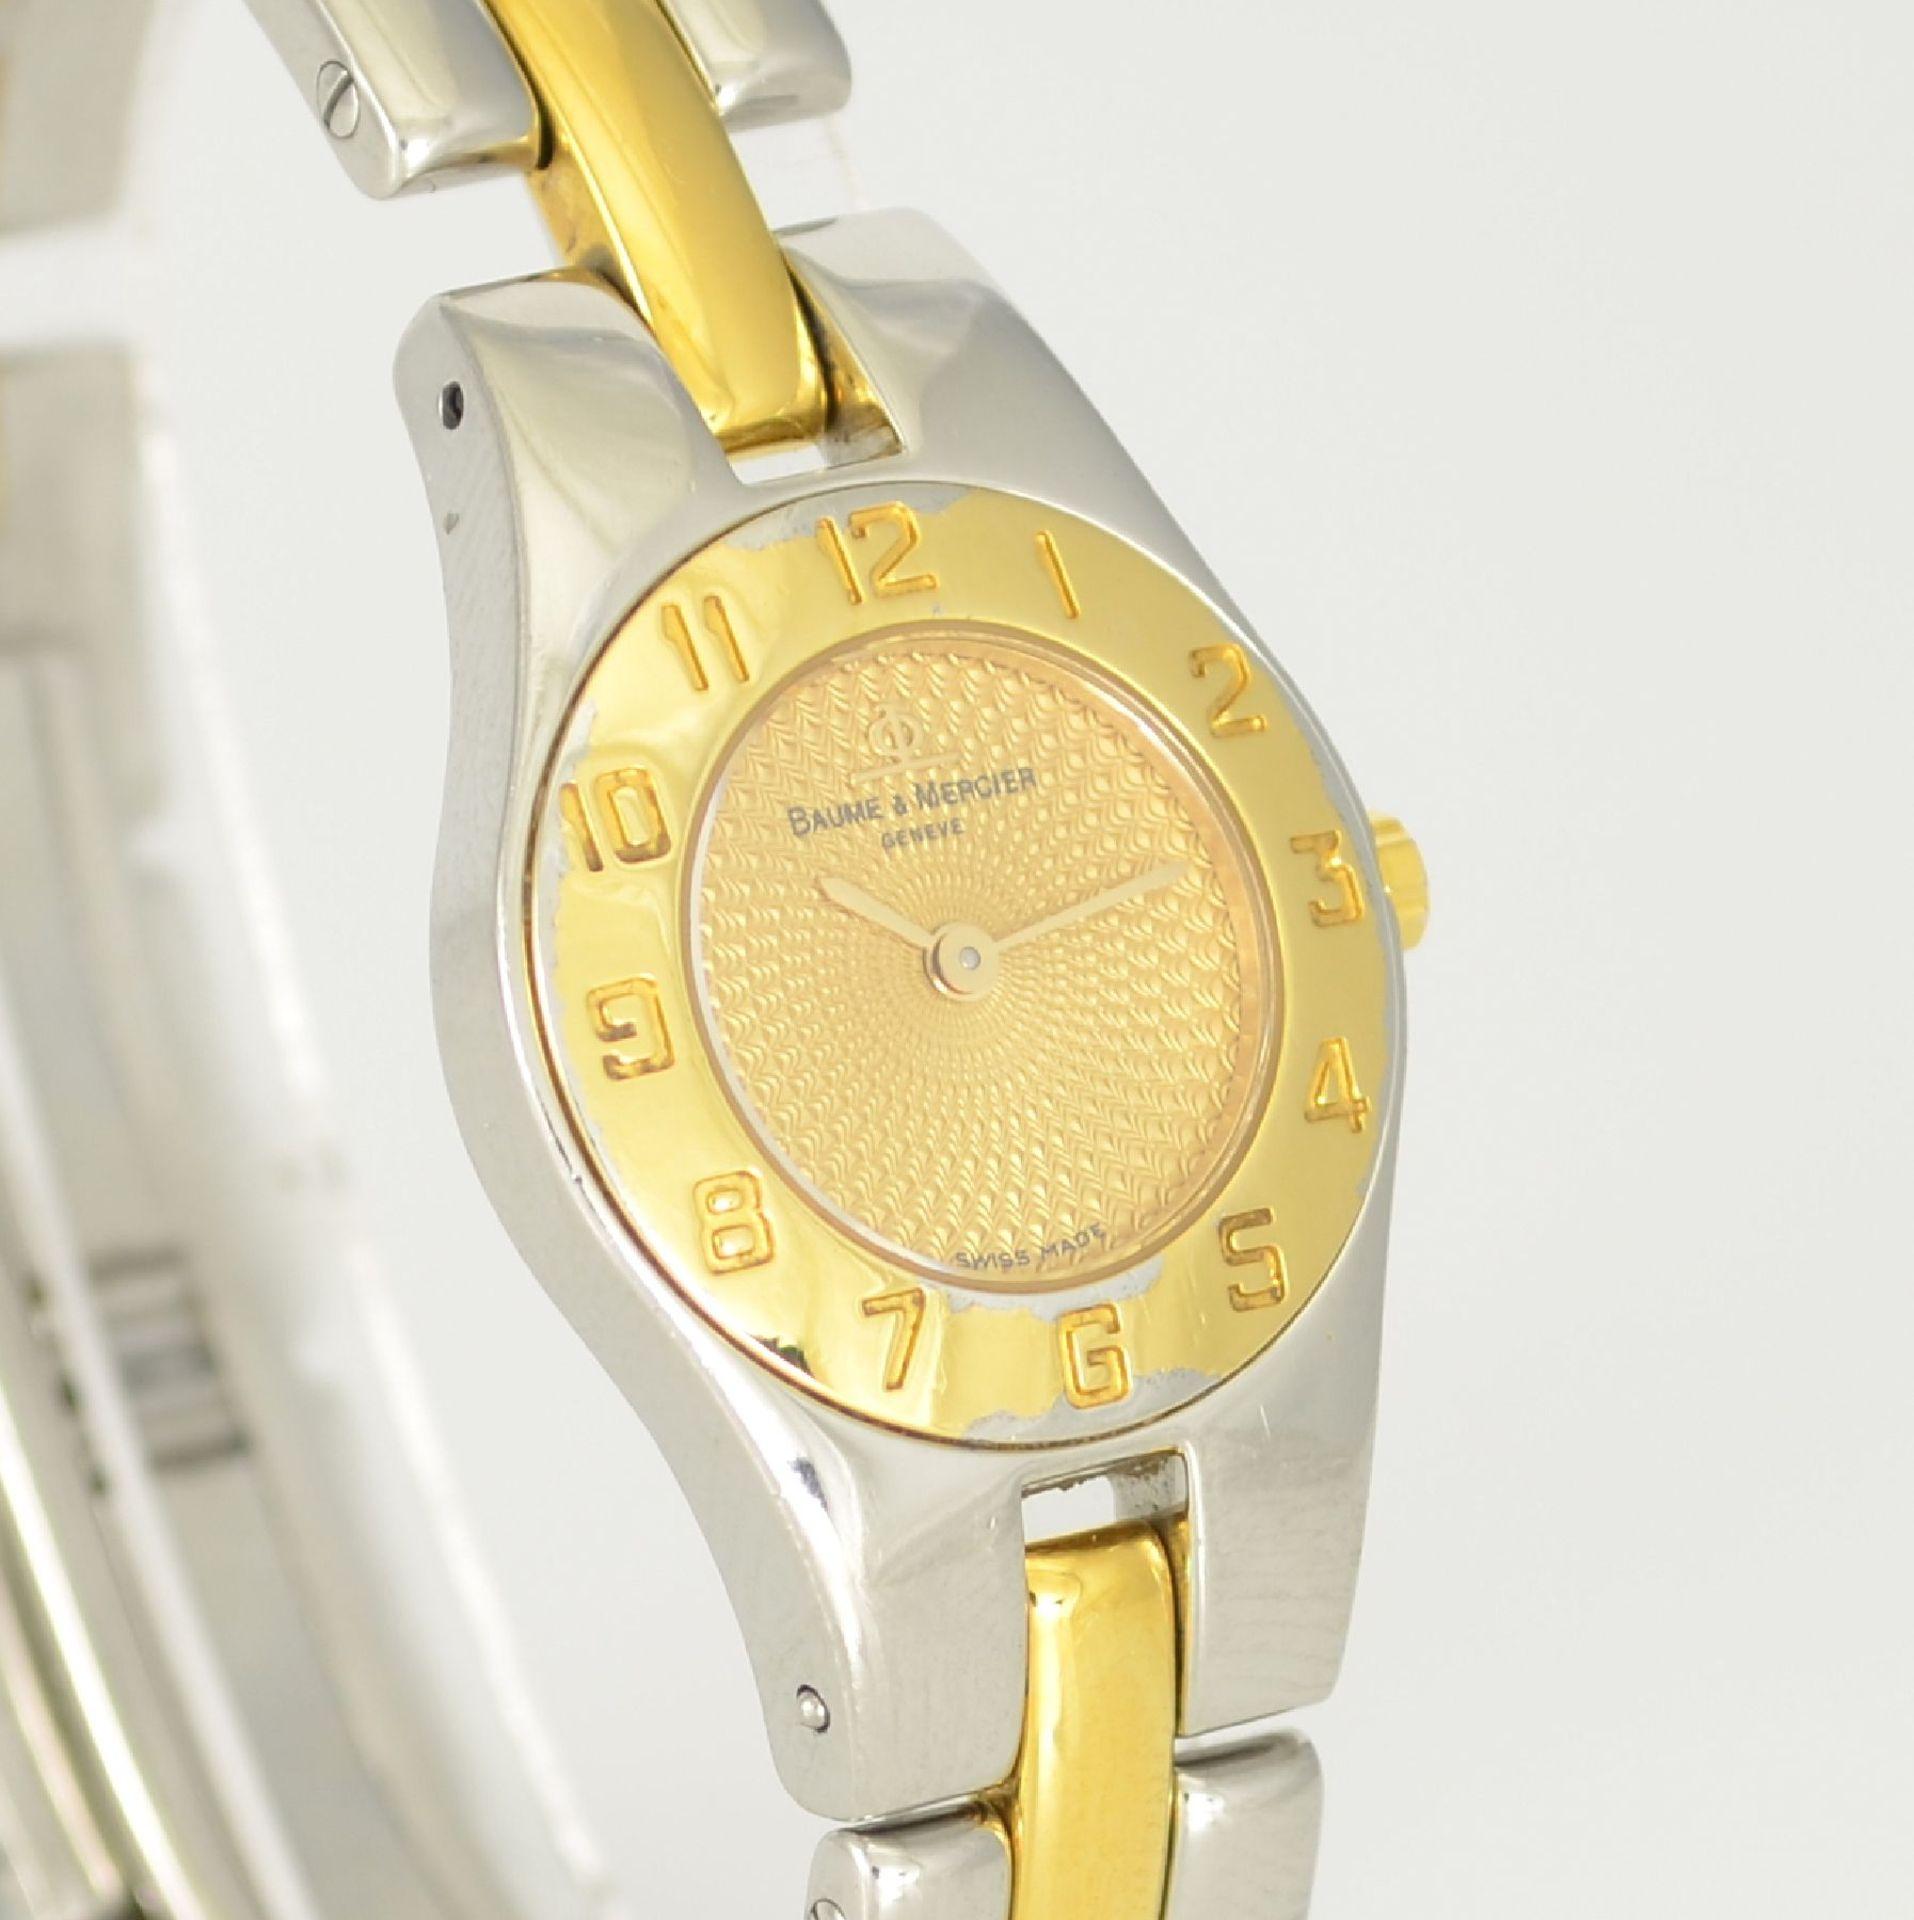 BAUME & MERCIER Damenarmbanduhr in Stahl/ vergoldet, Schweiz um 2000, gedr. Geh. m. integr. - Bild 4 aus 6